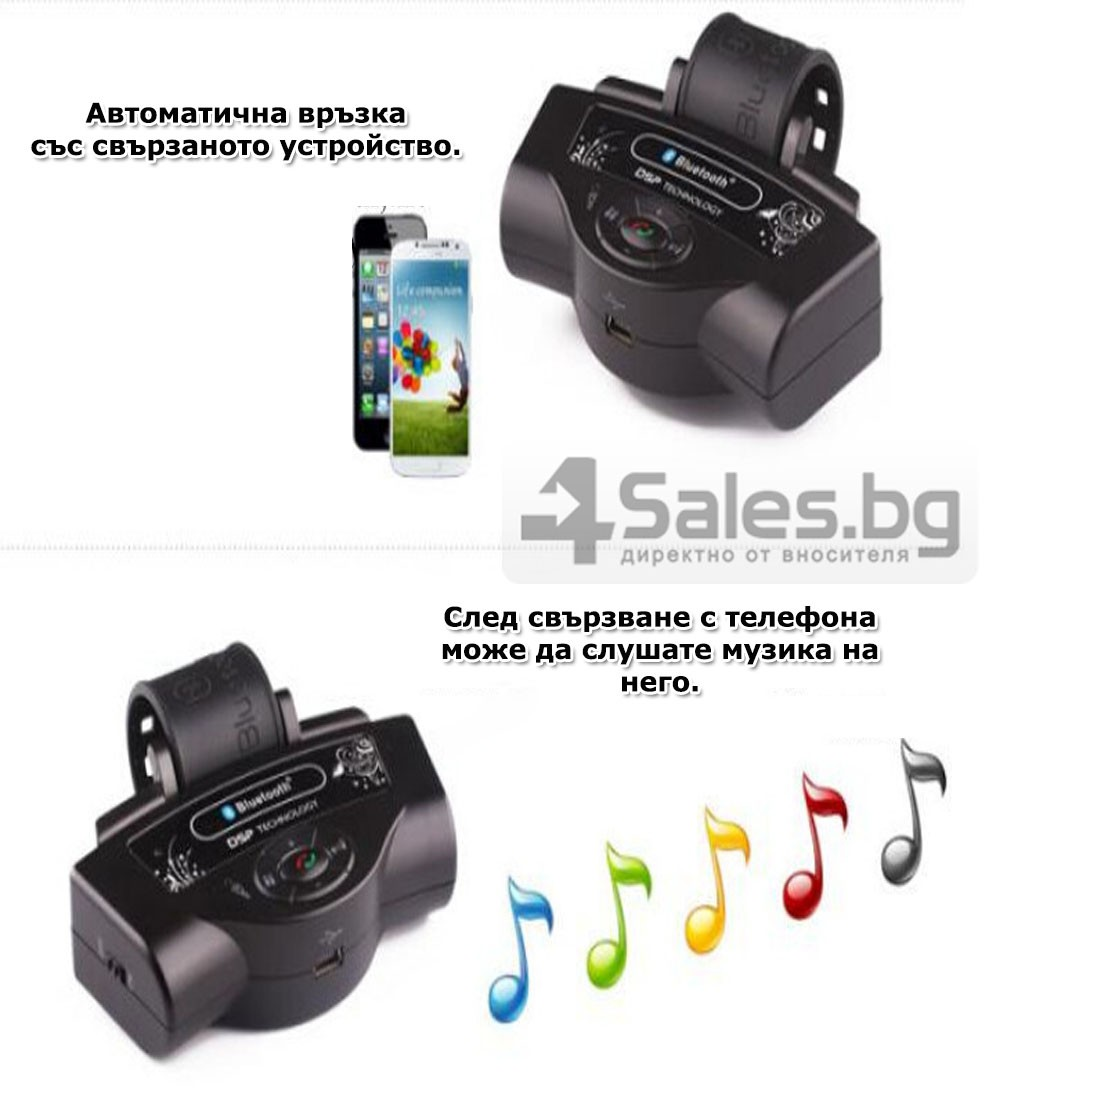 Bluetooth handsfree свободни ръце за волан на автомобил с високоговорител HF1 15